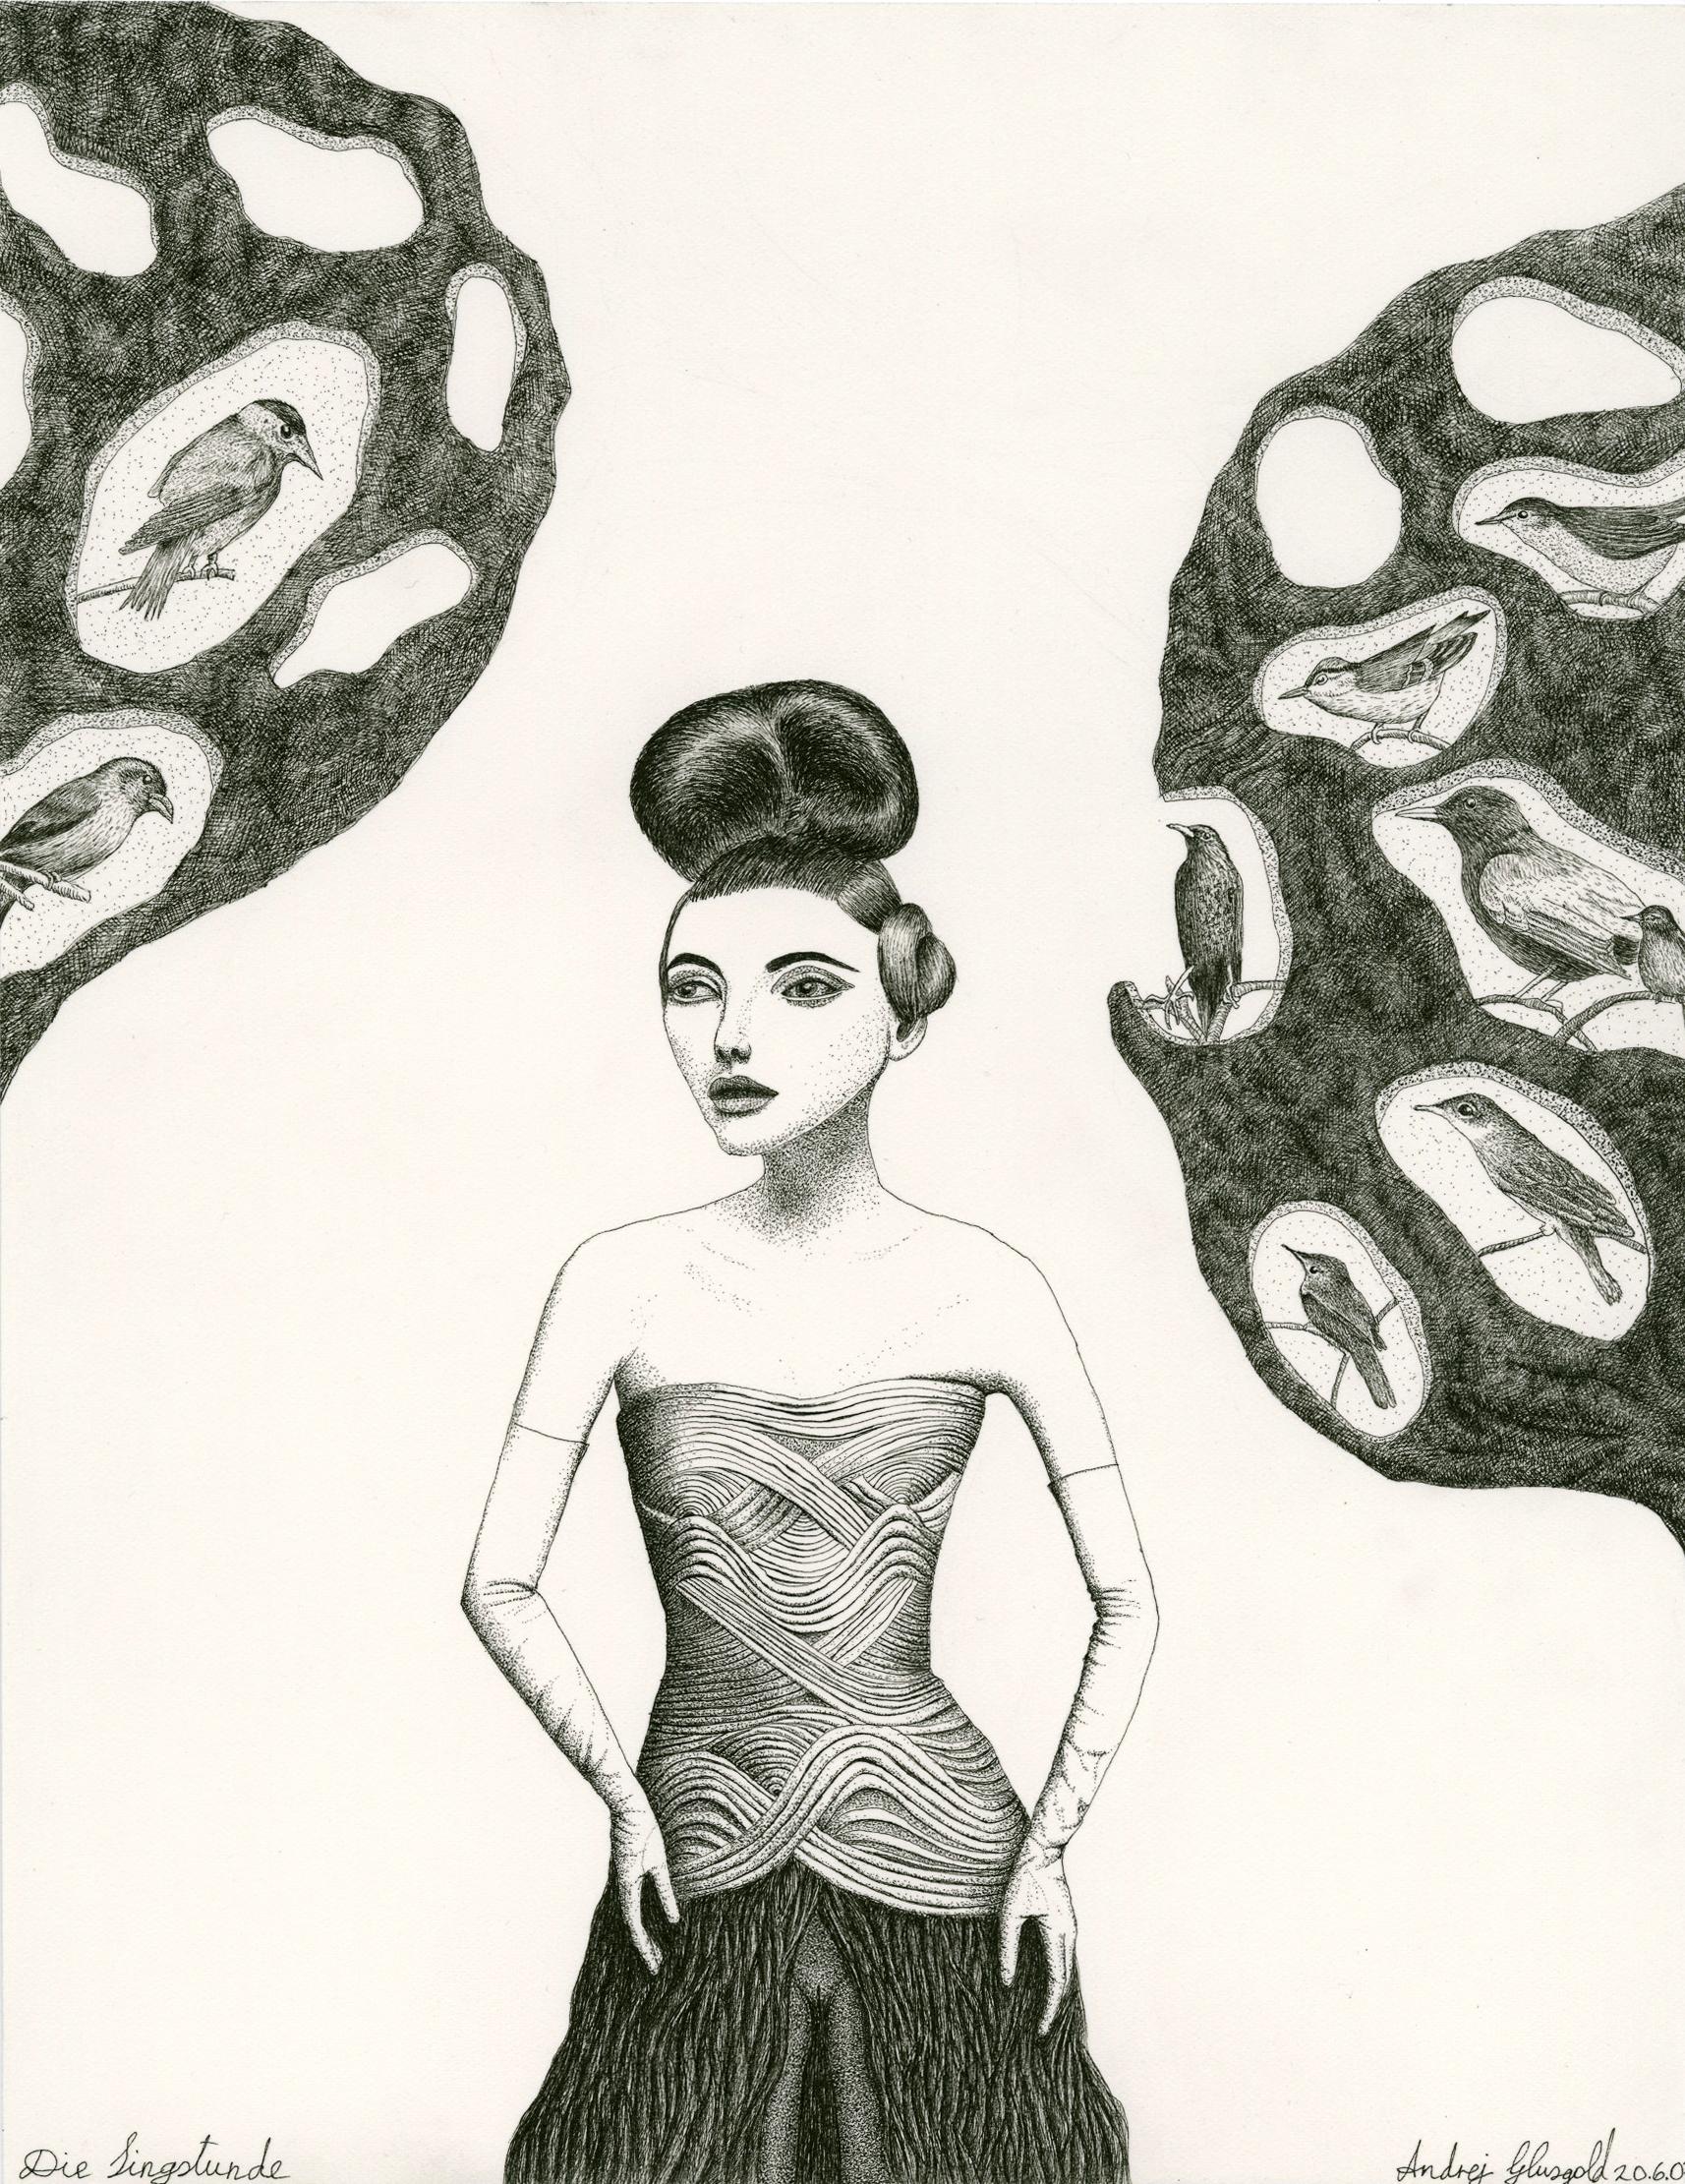 2007-Glusgold-Drawings-009.jpg